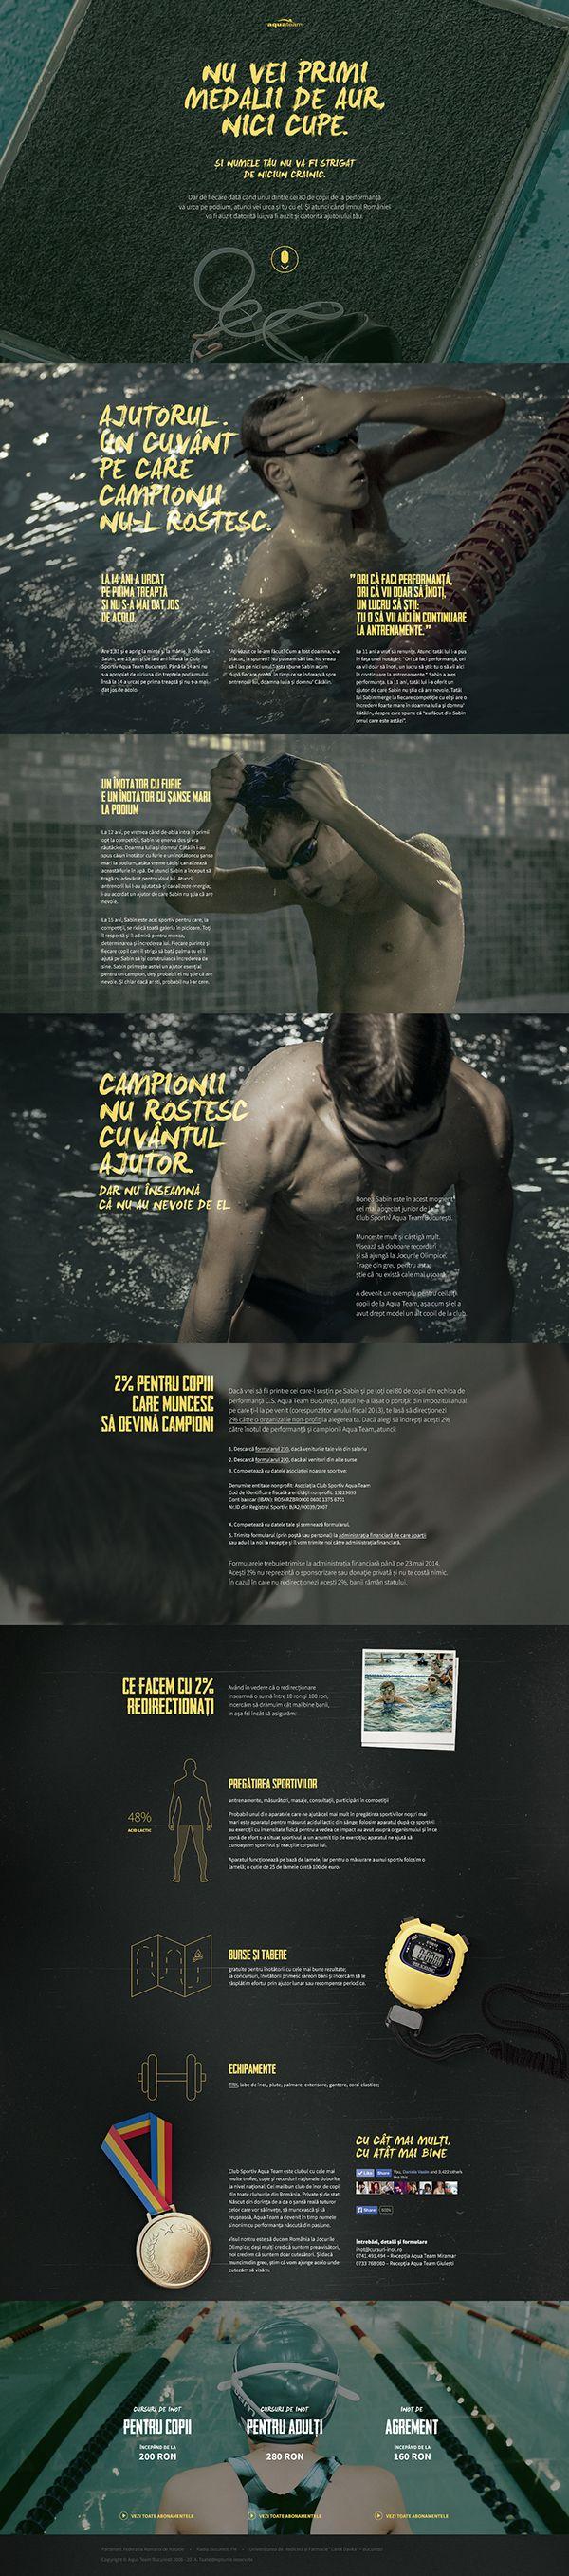 Fundraising Campaign for Aqua Team Swimming Club by Horia Manolache, via Behance